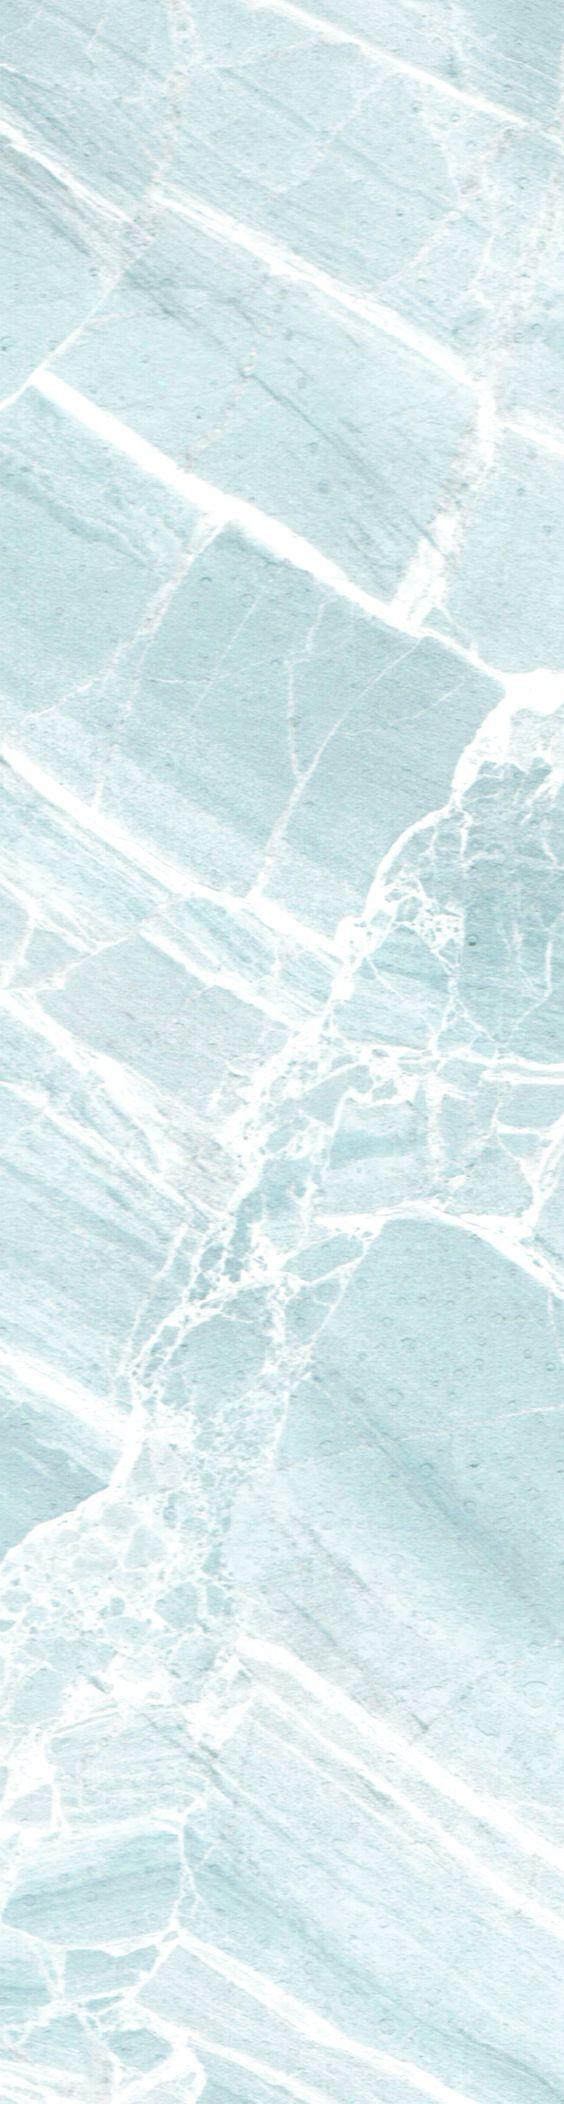 Good Wallpaper Marble Turquoise - 73b91fc6964094e15e5c14b1f606e0f3  HD_611359.jpg